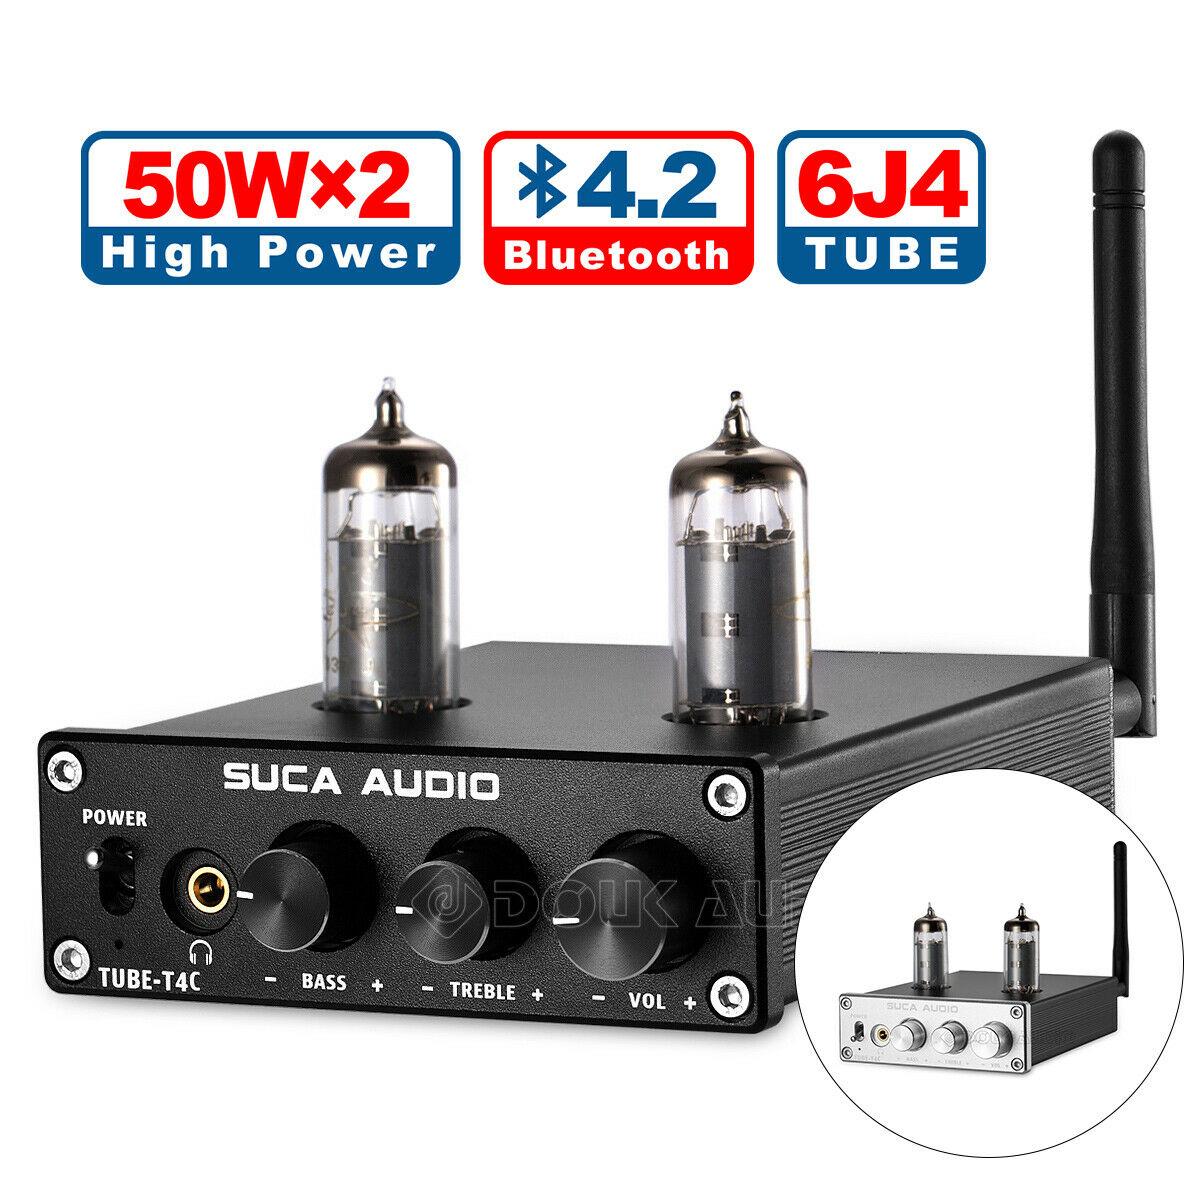 Mini HiFi Valve Tube Power Amplifier Bluetooth 4.2 Receiver Stereo Headphone AmpMini HiFi Valve Tube Power Amplifier Bluetooth 4.2 Receiver Stereo Headphone Amp